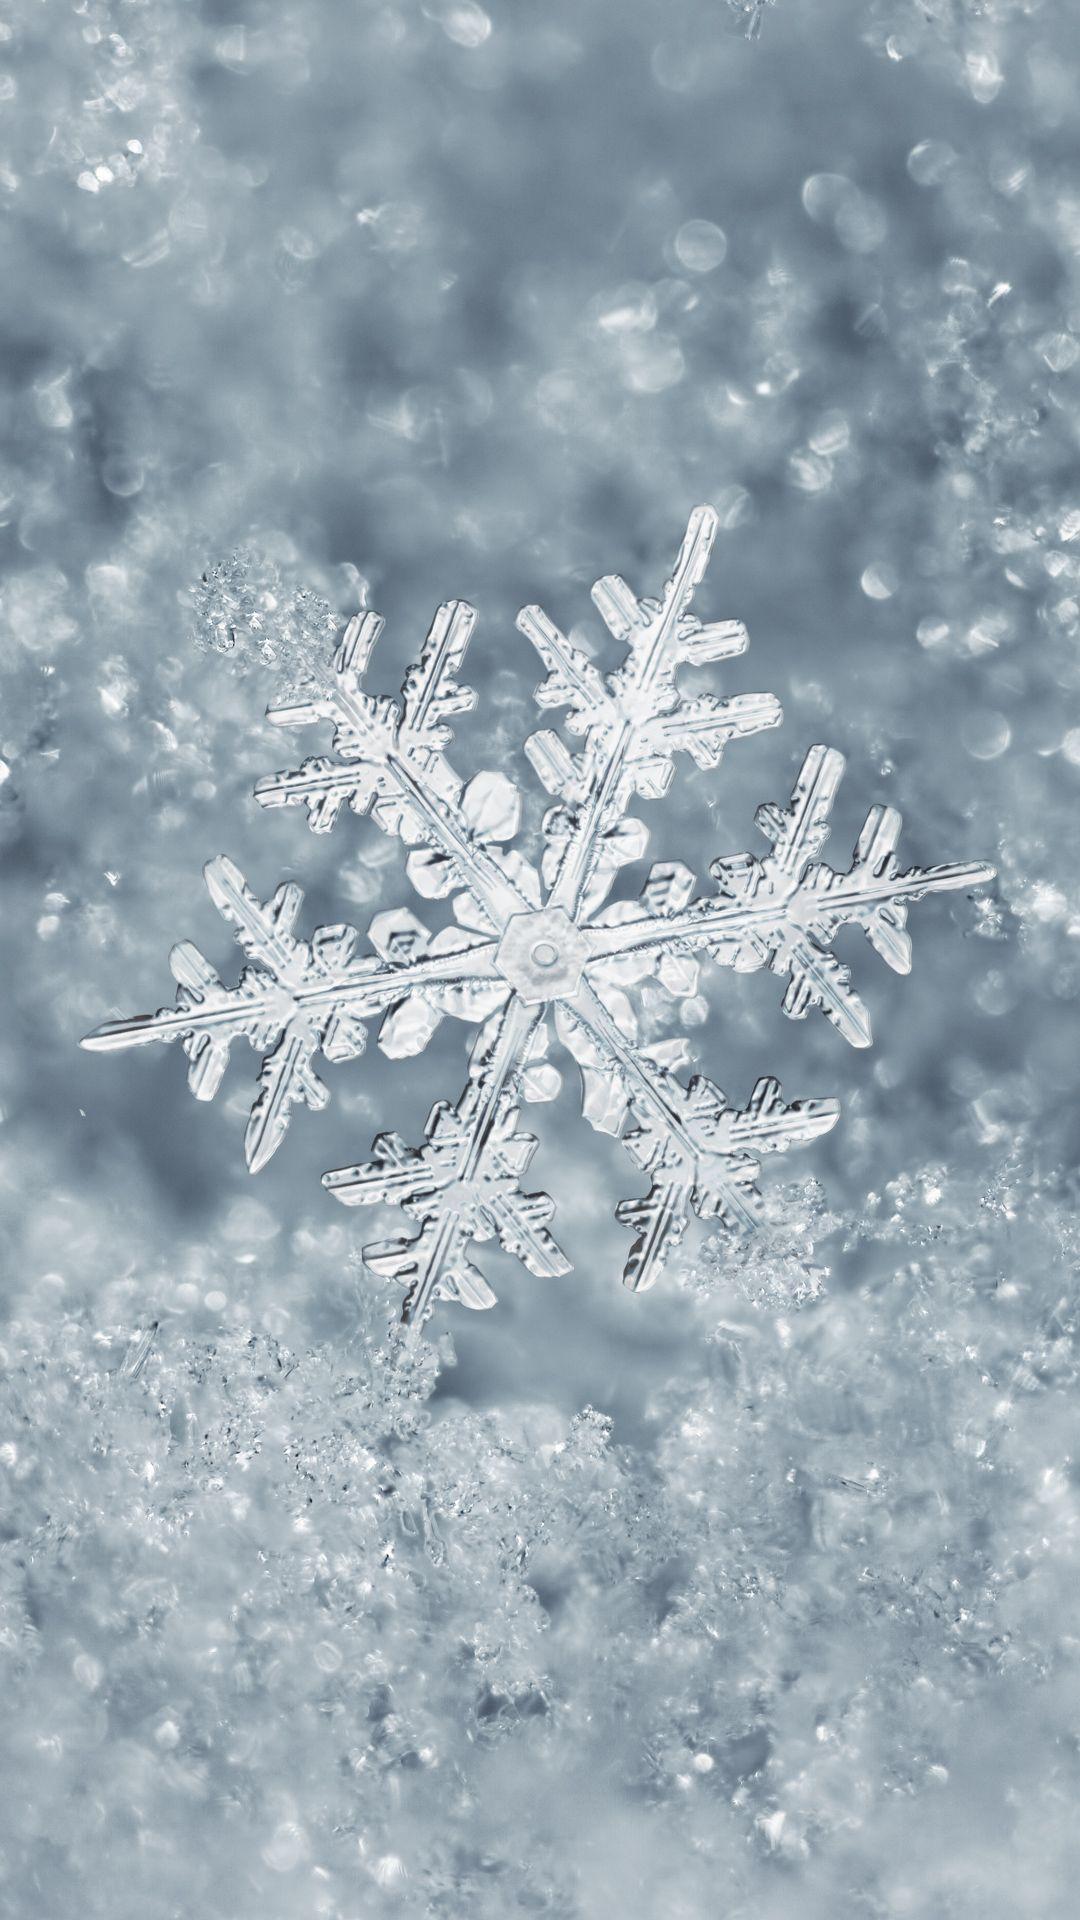 Ice Snowflake Iphone 7 Plus Wallpaper